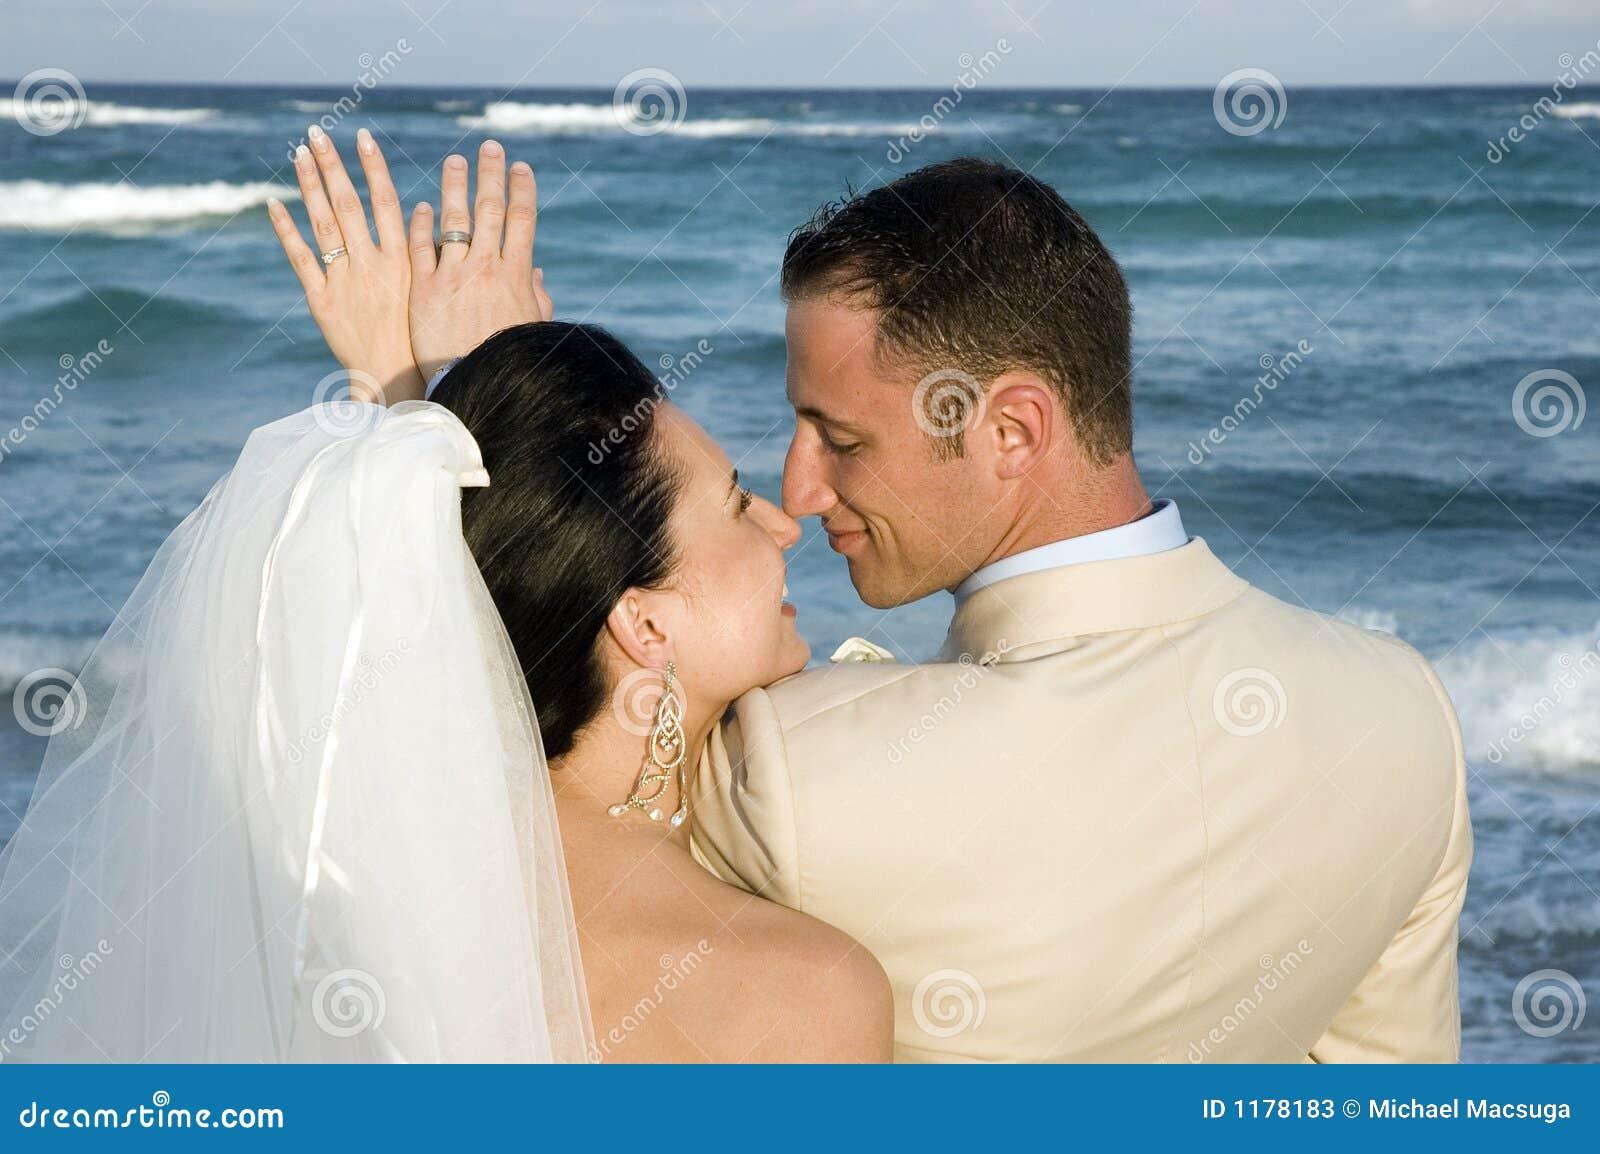 Caribbean Beach Wedding - The Rings